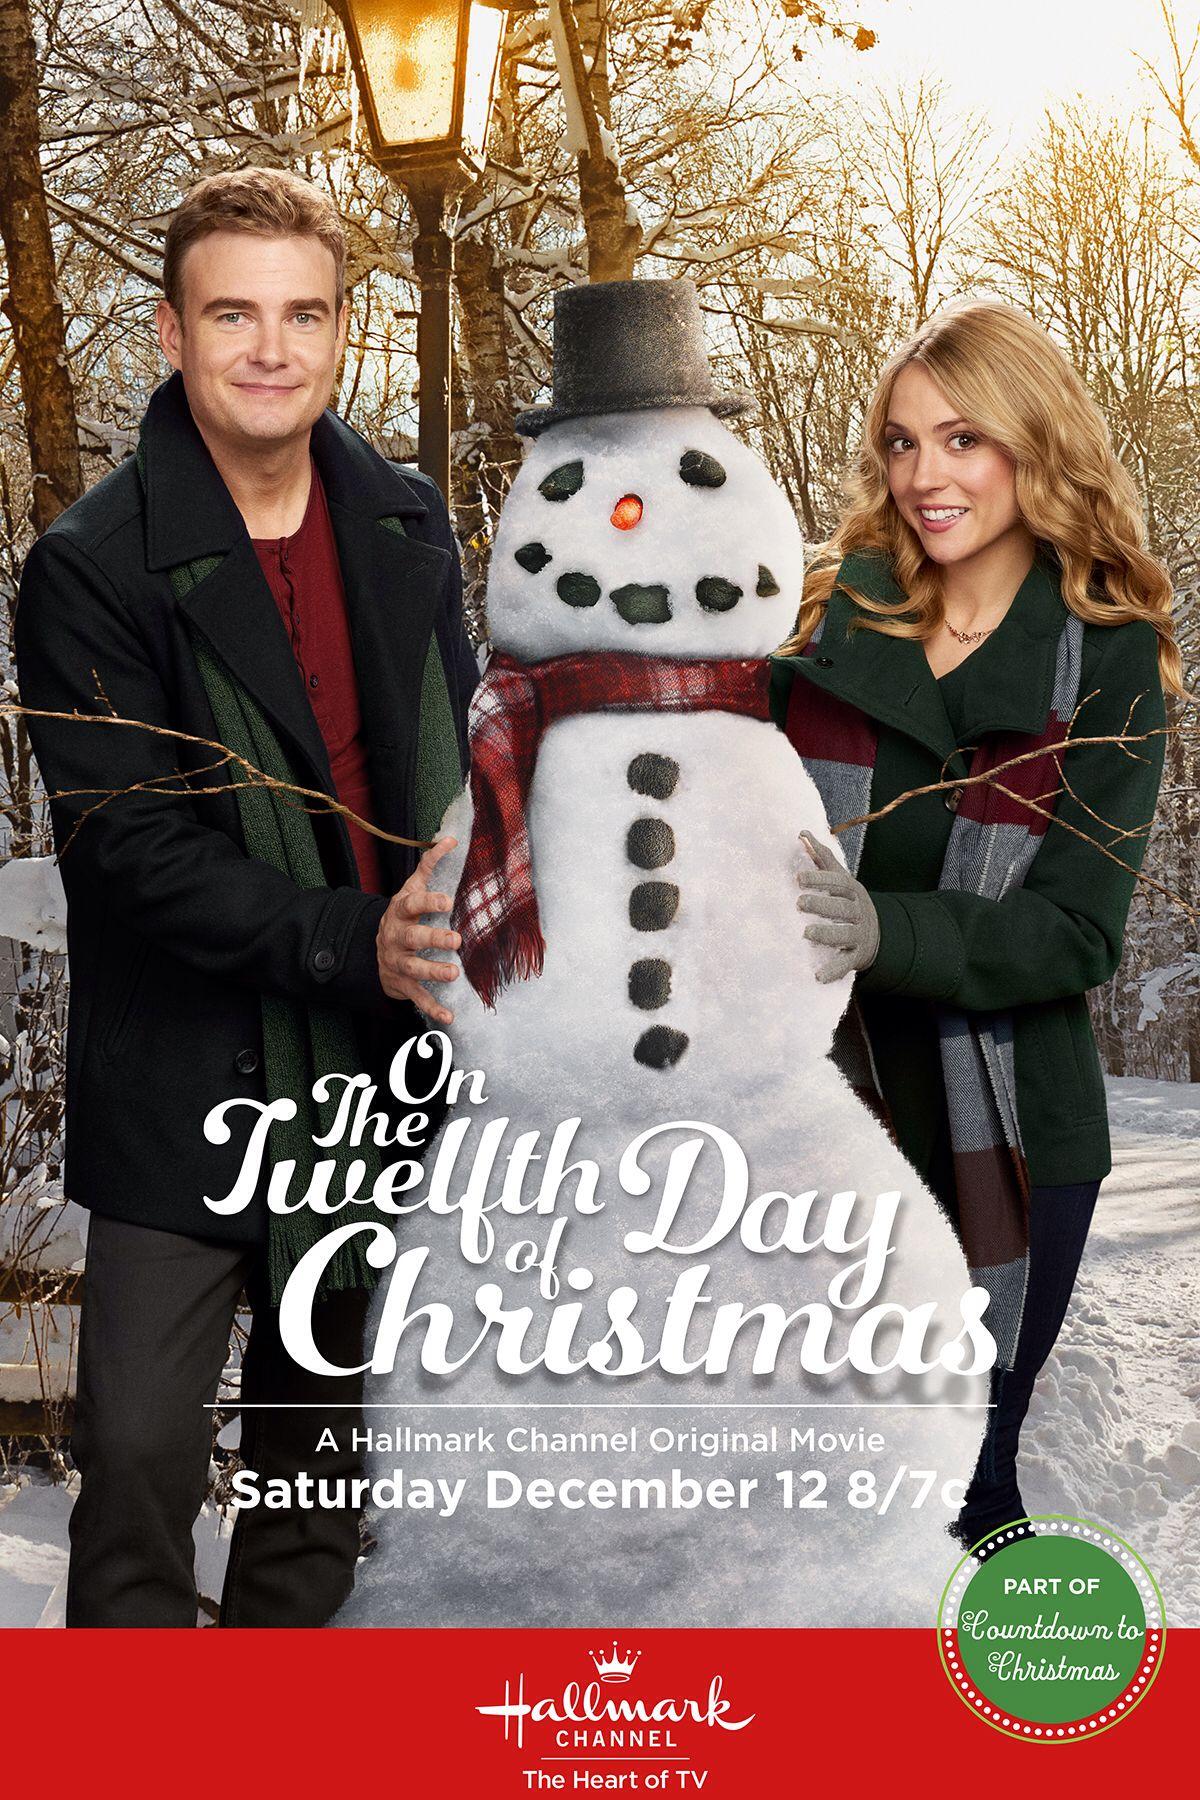 On the 12th day of Christmas hallmark movie | Christmas Movies ...